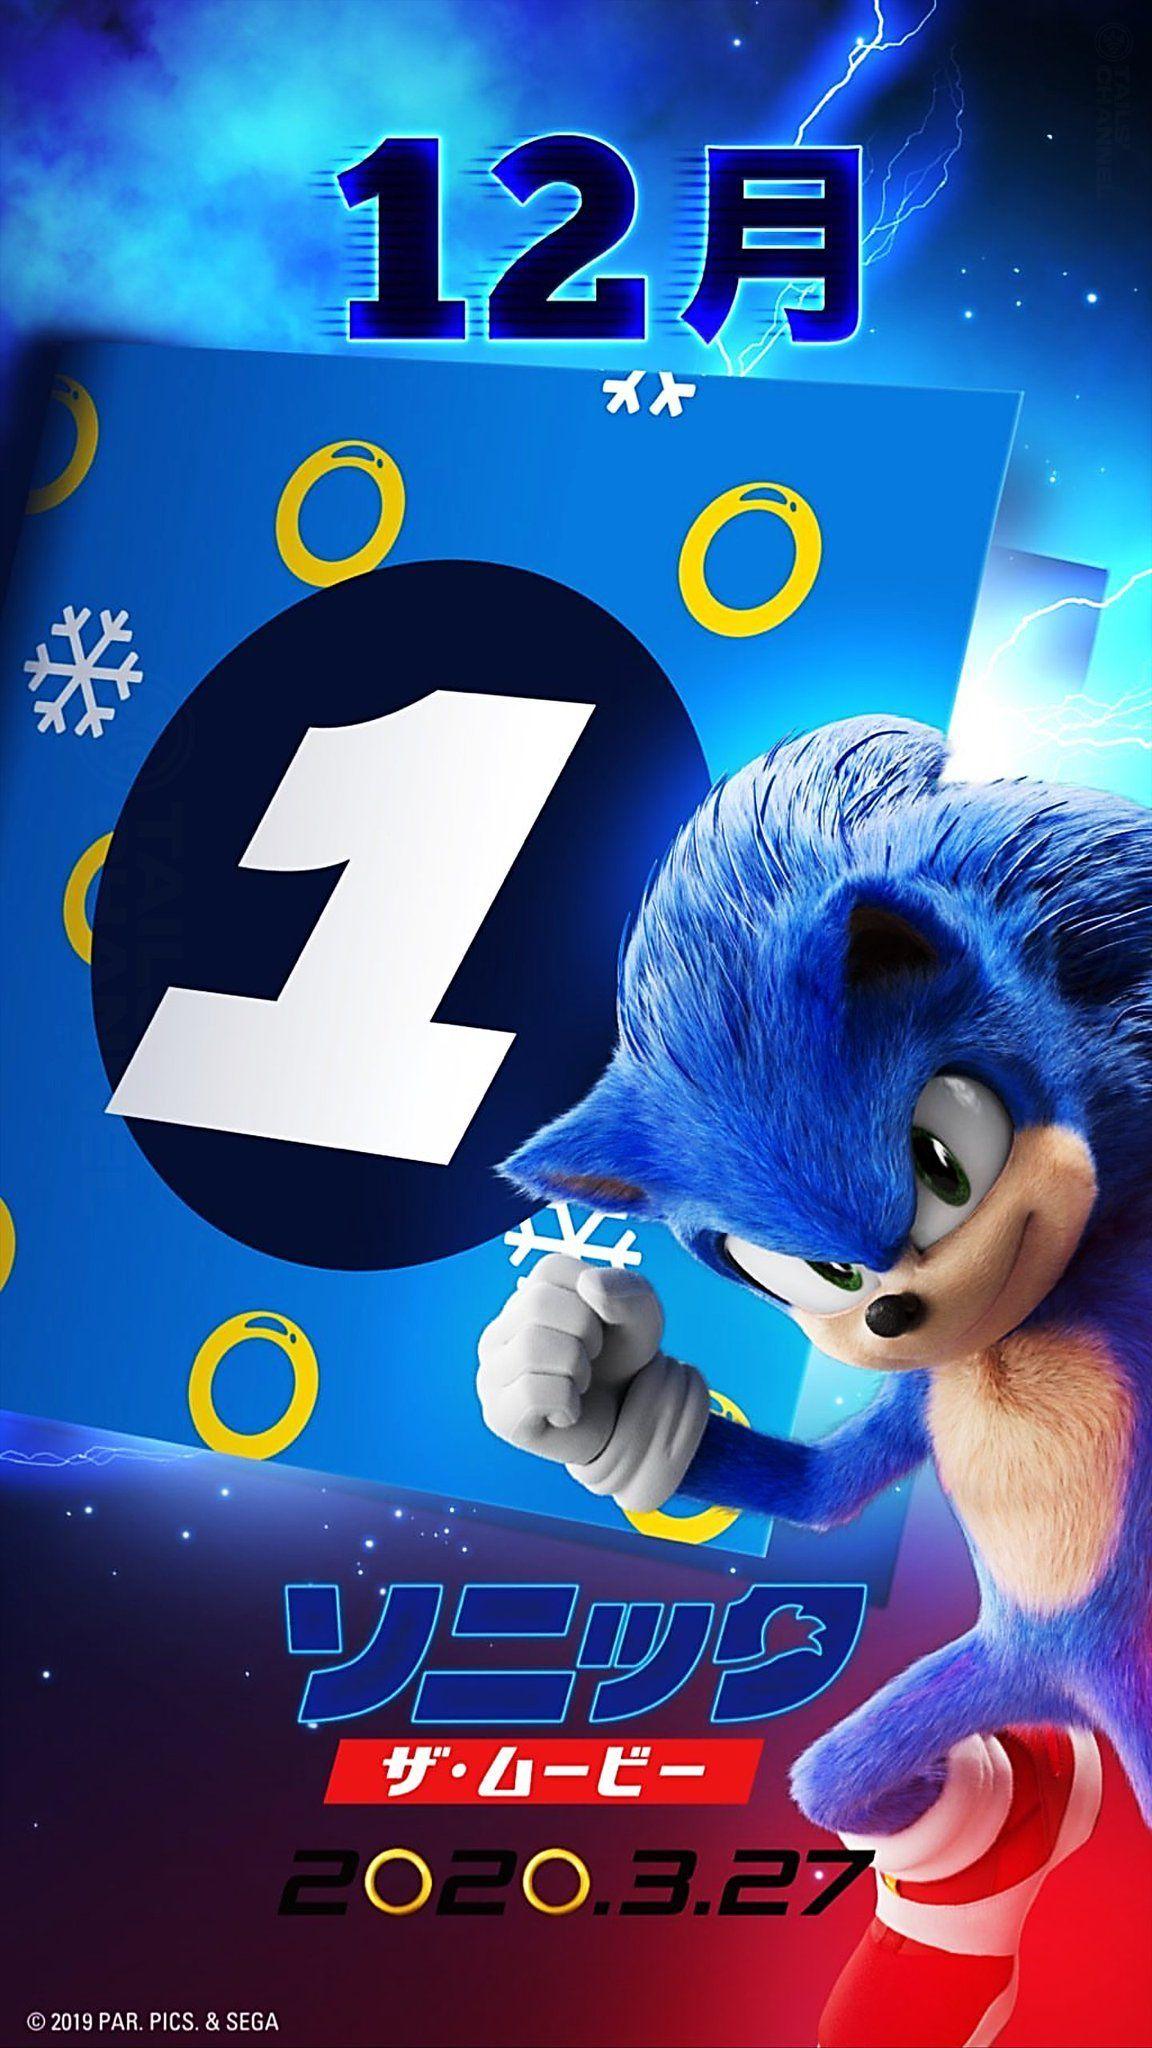 Ver Sonic La Pelicula Online Espanol 2020 Peliculas Ver Peliculas En Linea Gratis Mira Peliculas Sonic Sonic The Hedgehog Hedgehog Movie